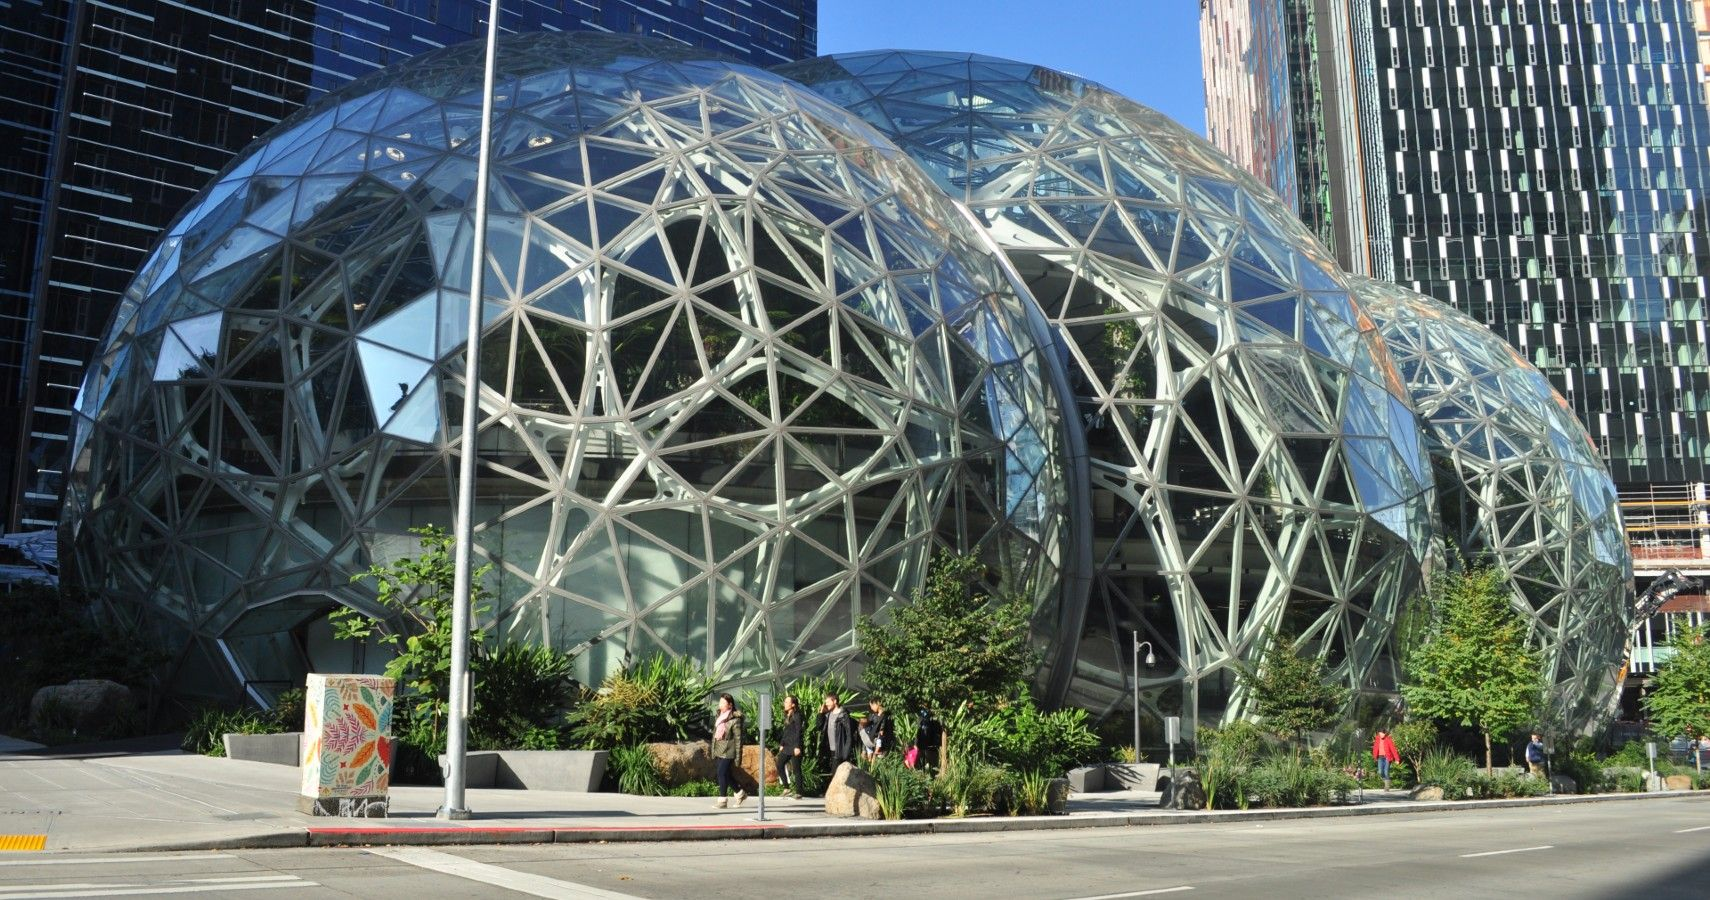 5 Futuristic Tech We Can Expect In Amazon's City Of The Future